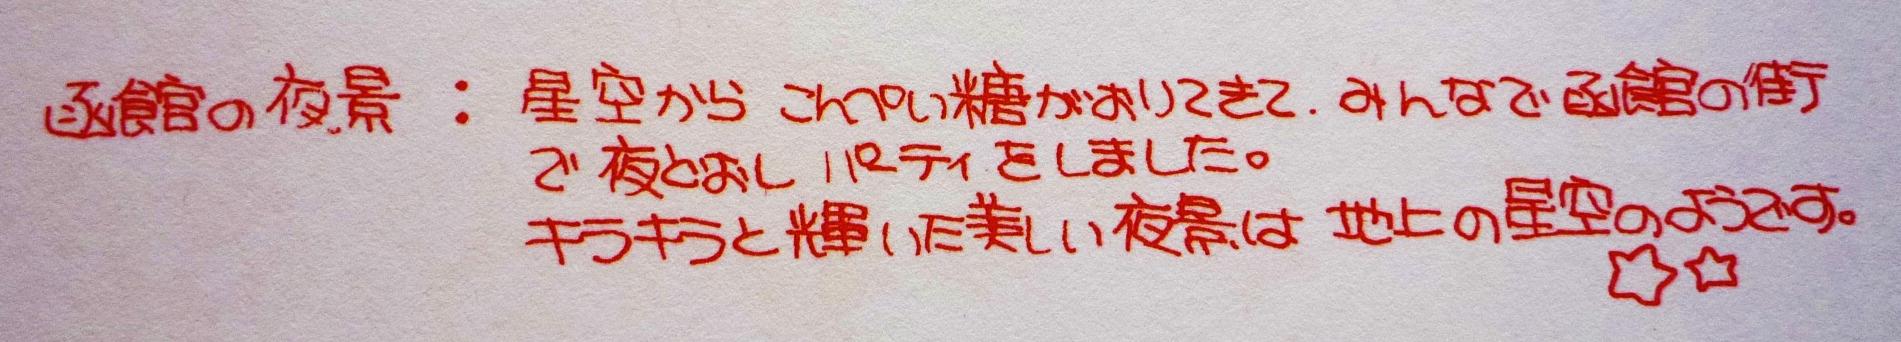 P1090039.JPG